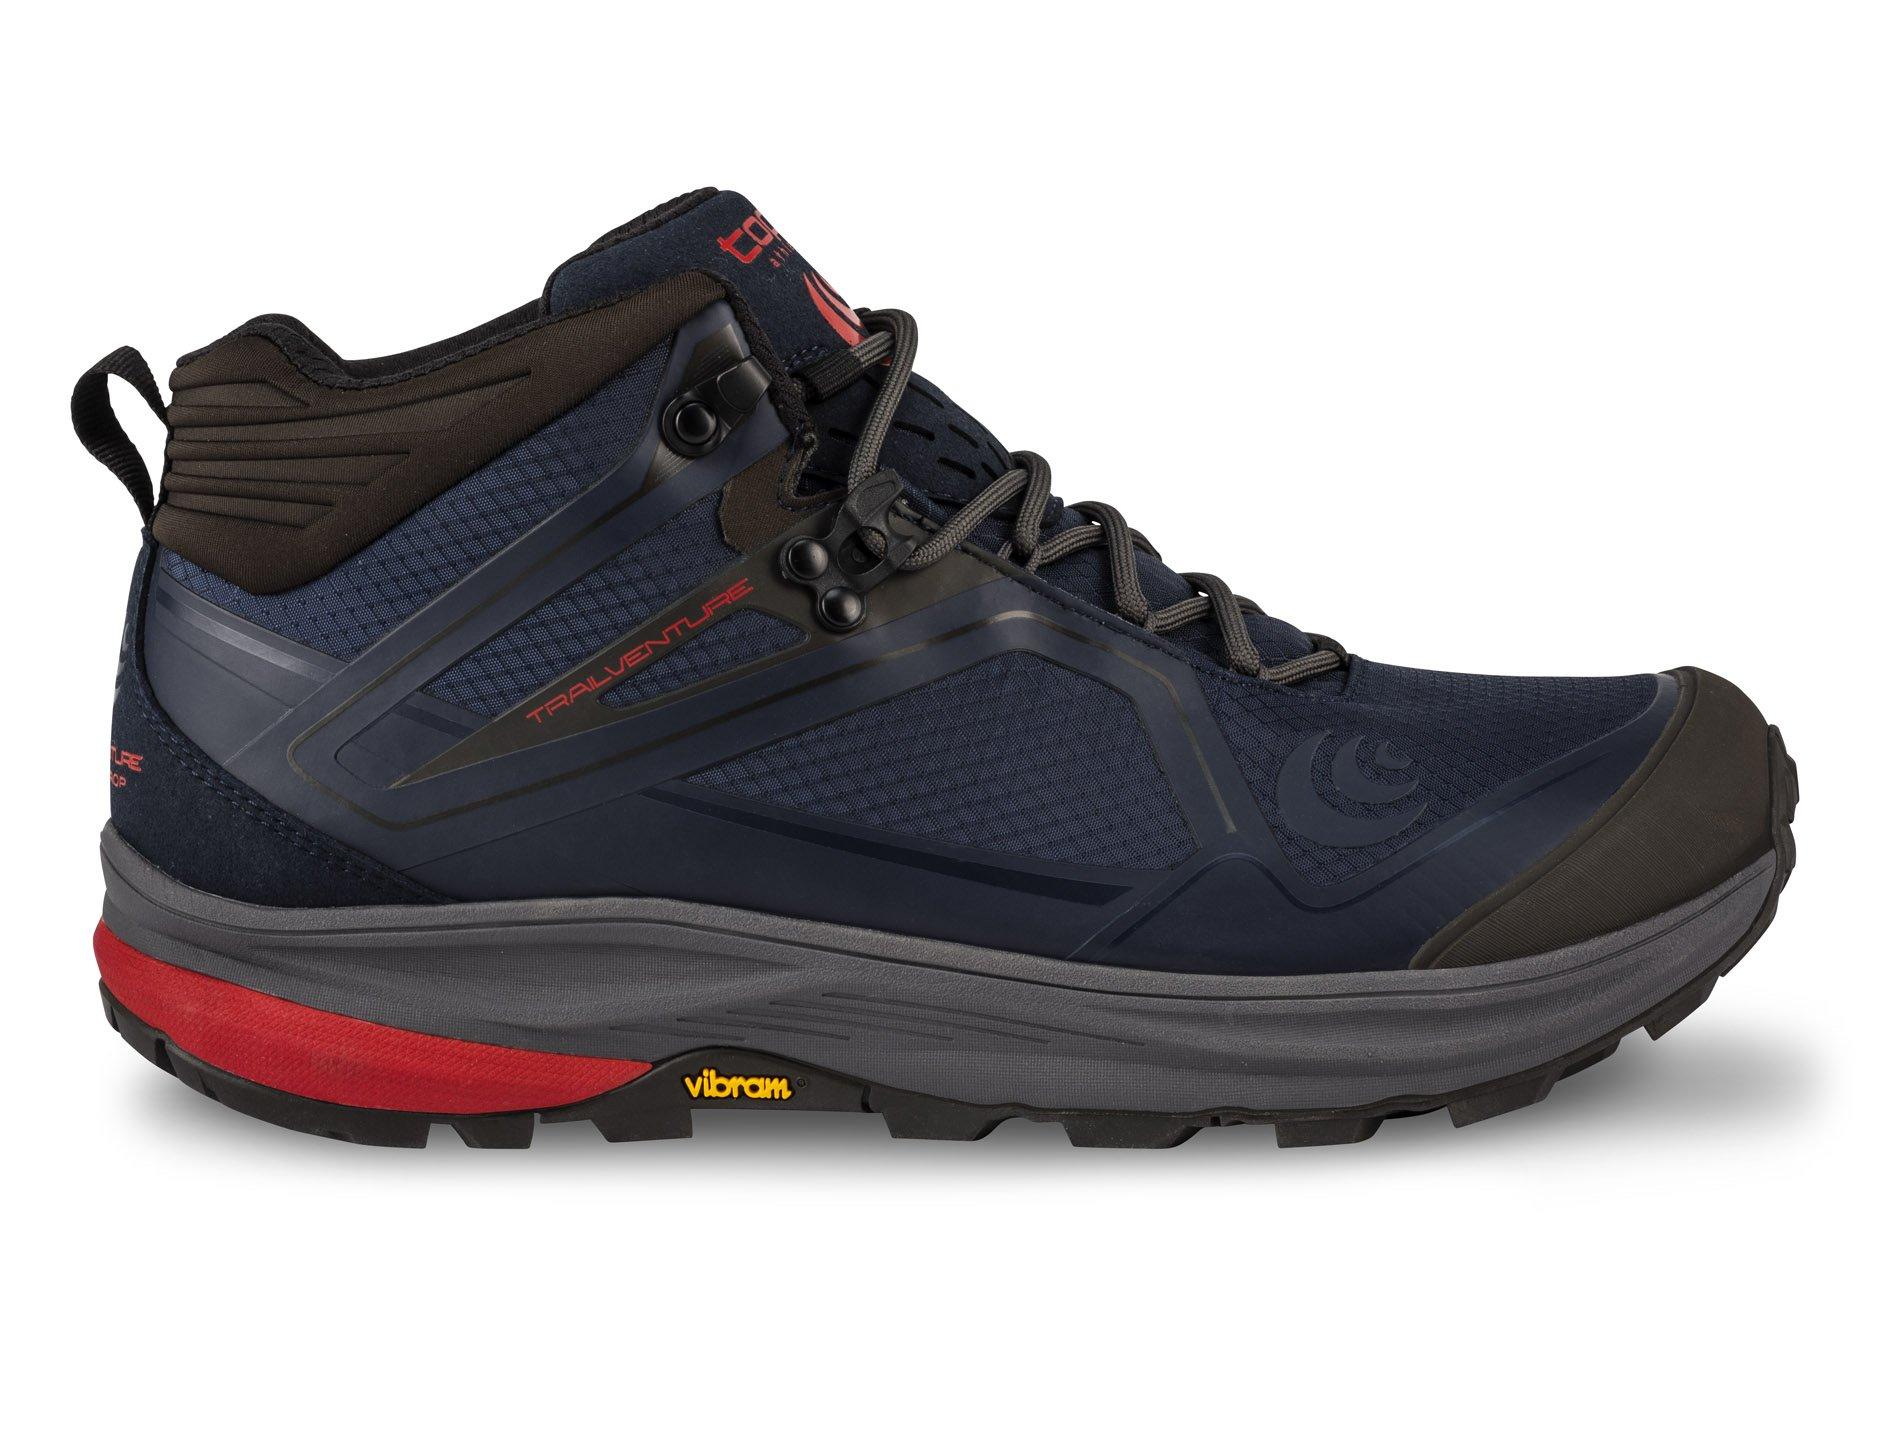 Topo Trailventure Men's Hiking Boot